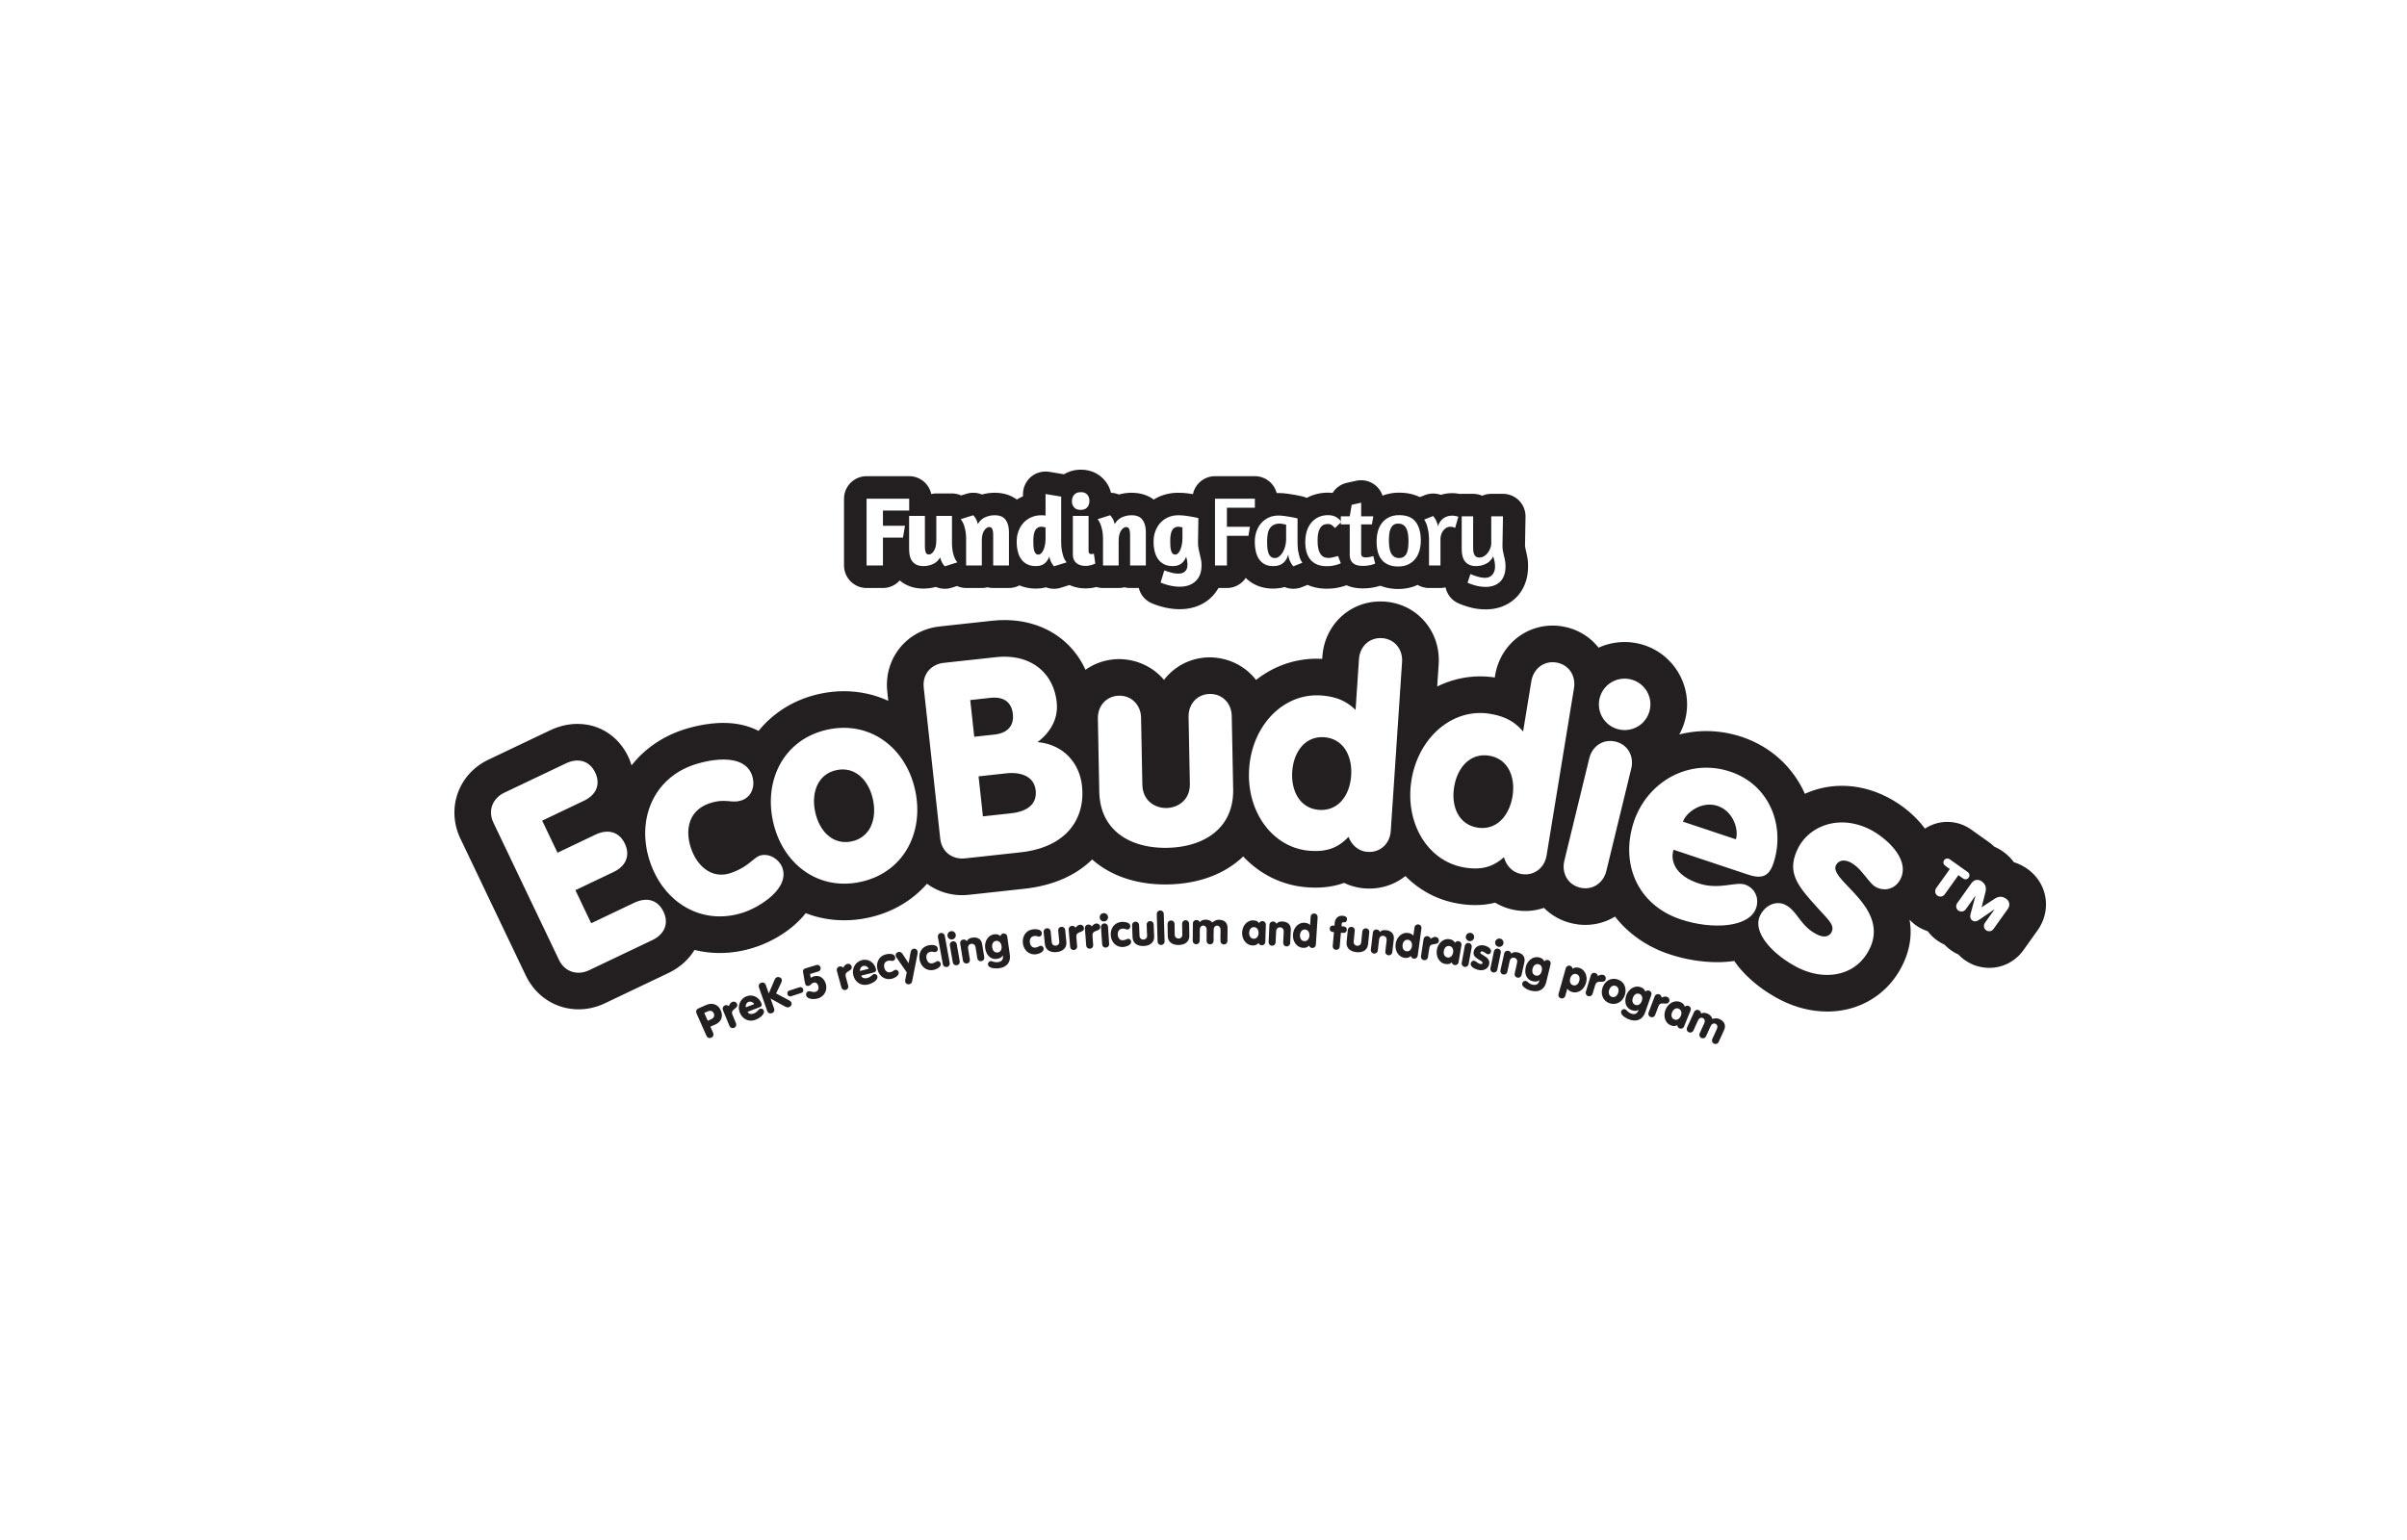 https://papaadvertising.com/wp-content/uploads/2015/04/EB-Logo.jpg